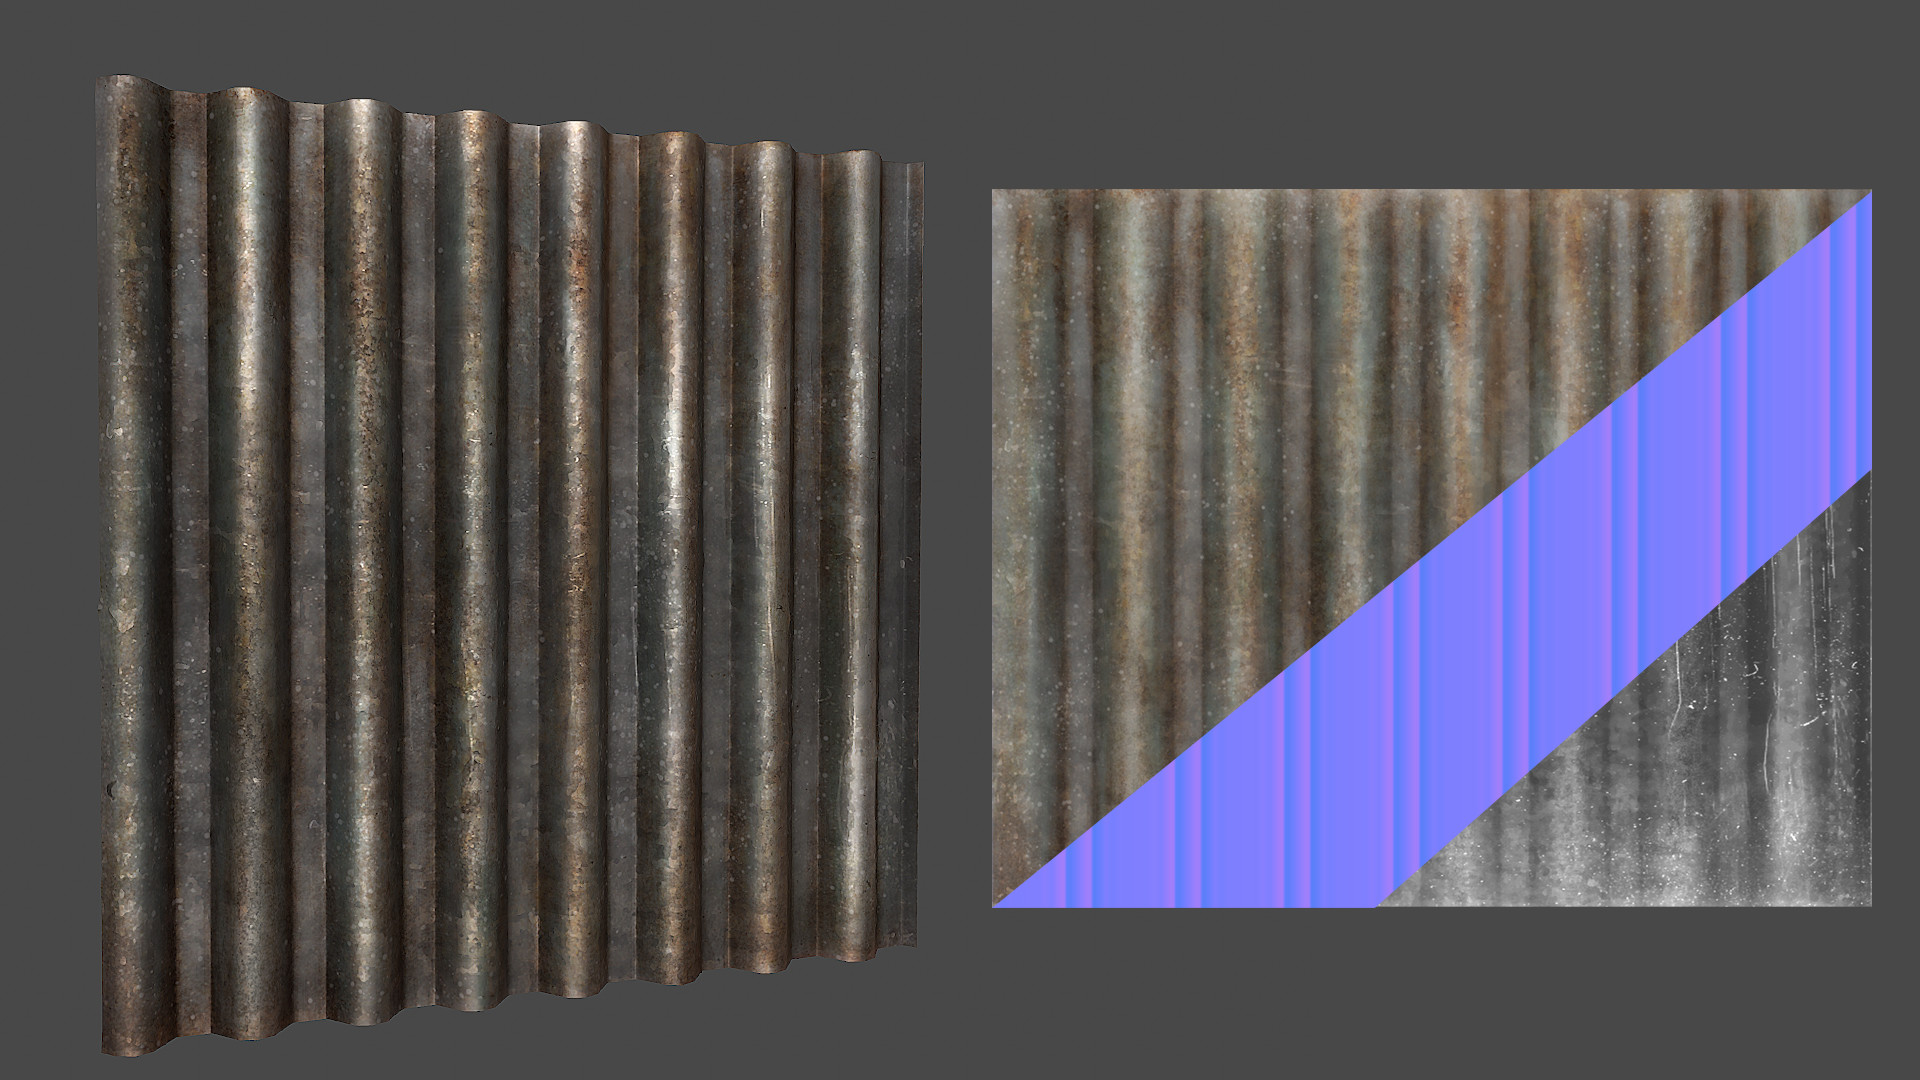 Najim filali saksak corrugated metal stylized